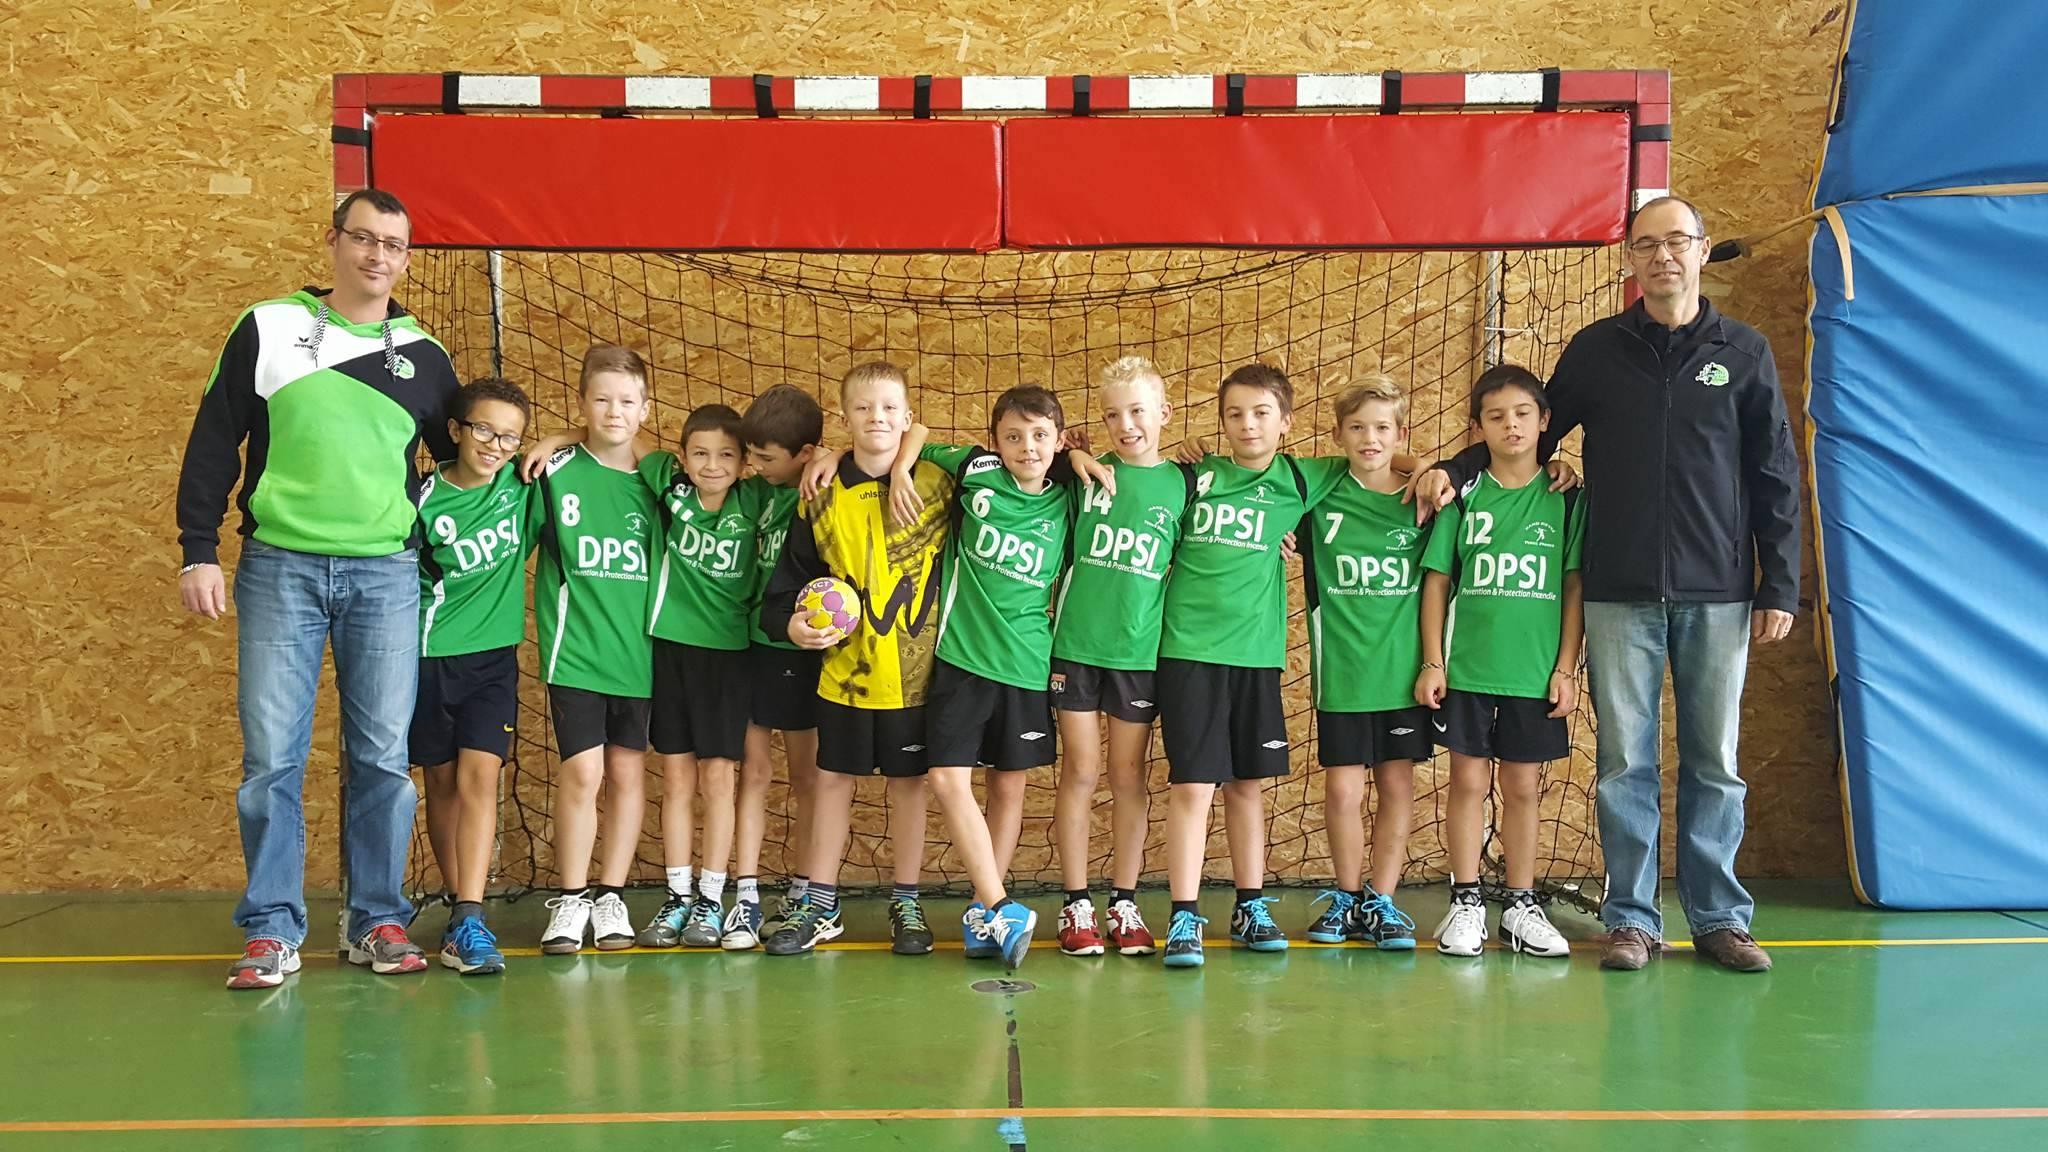 Les -12G apprennent et progressent - Hand Bievre Terres Froides - Club de Handball en Isère